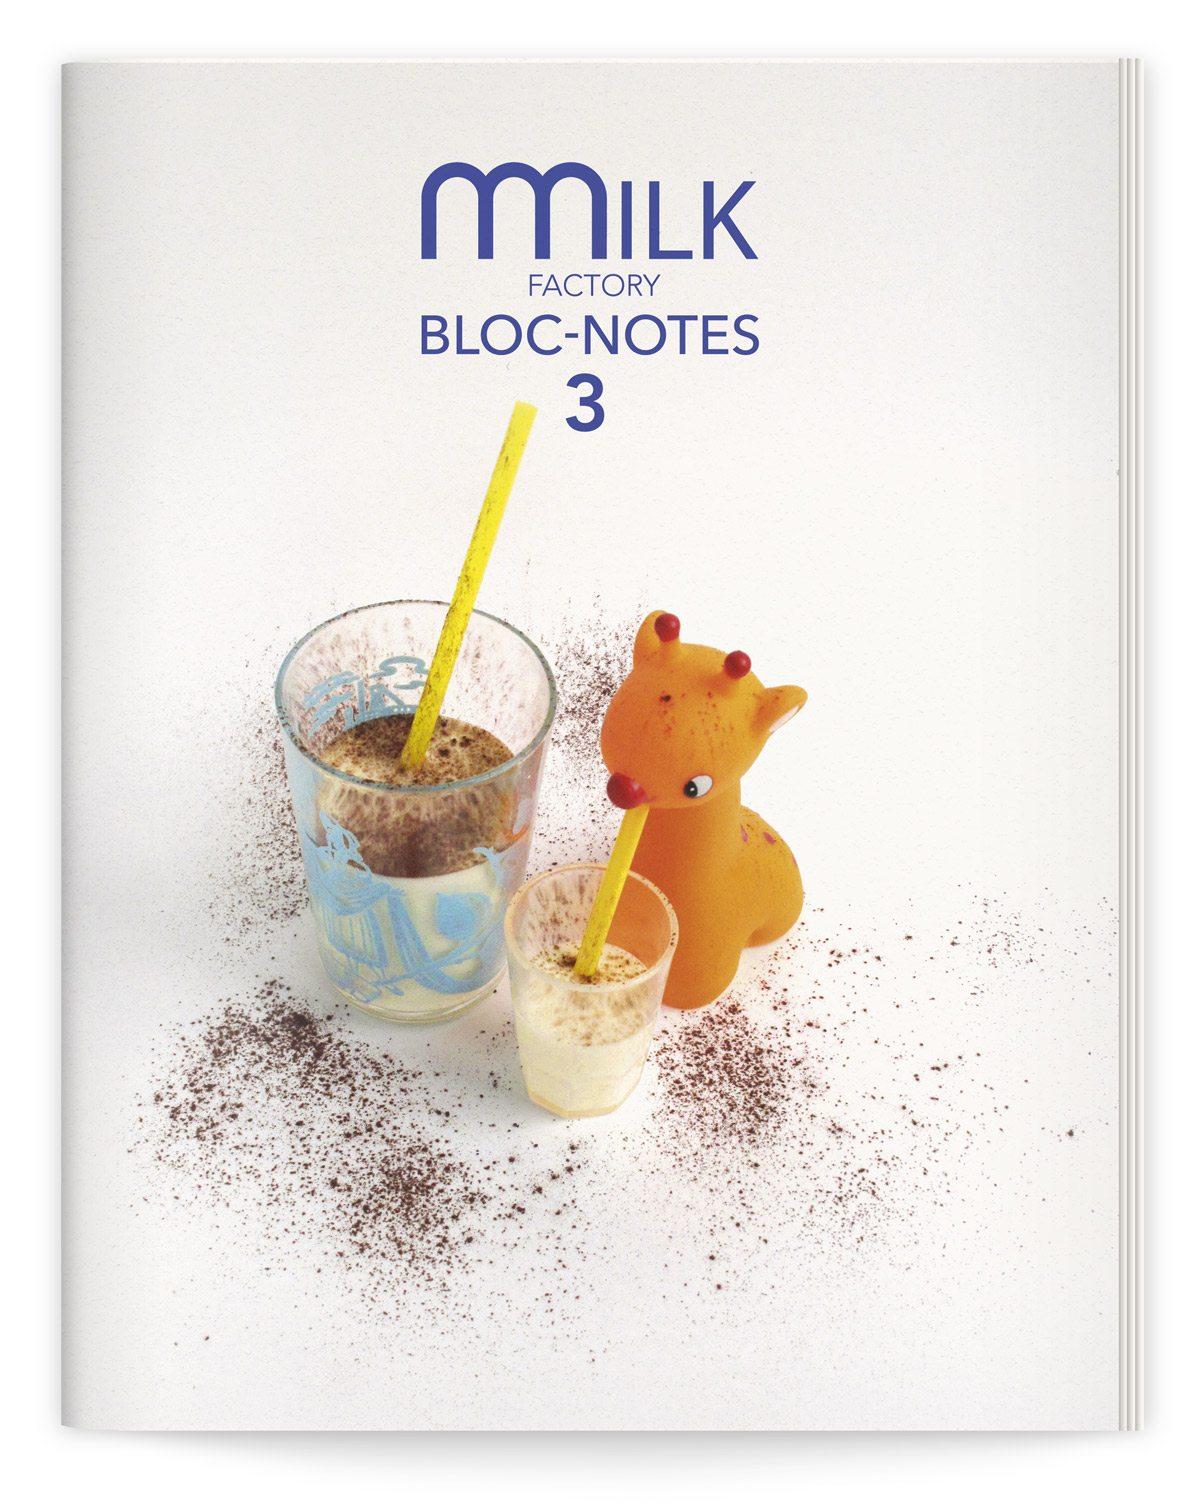 bloc-notes 3 milk factory couverture photo martine camillieri